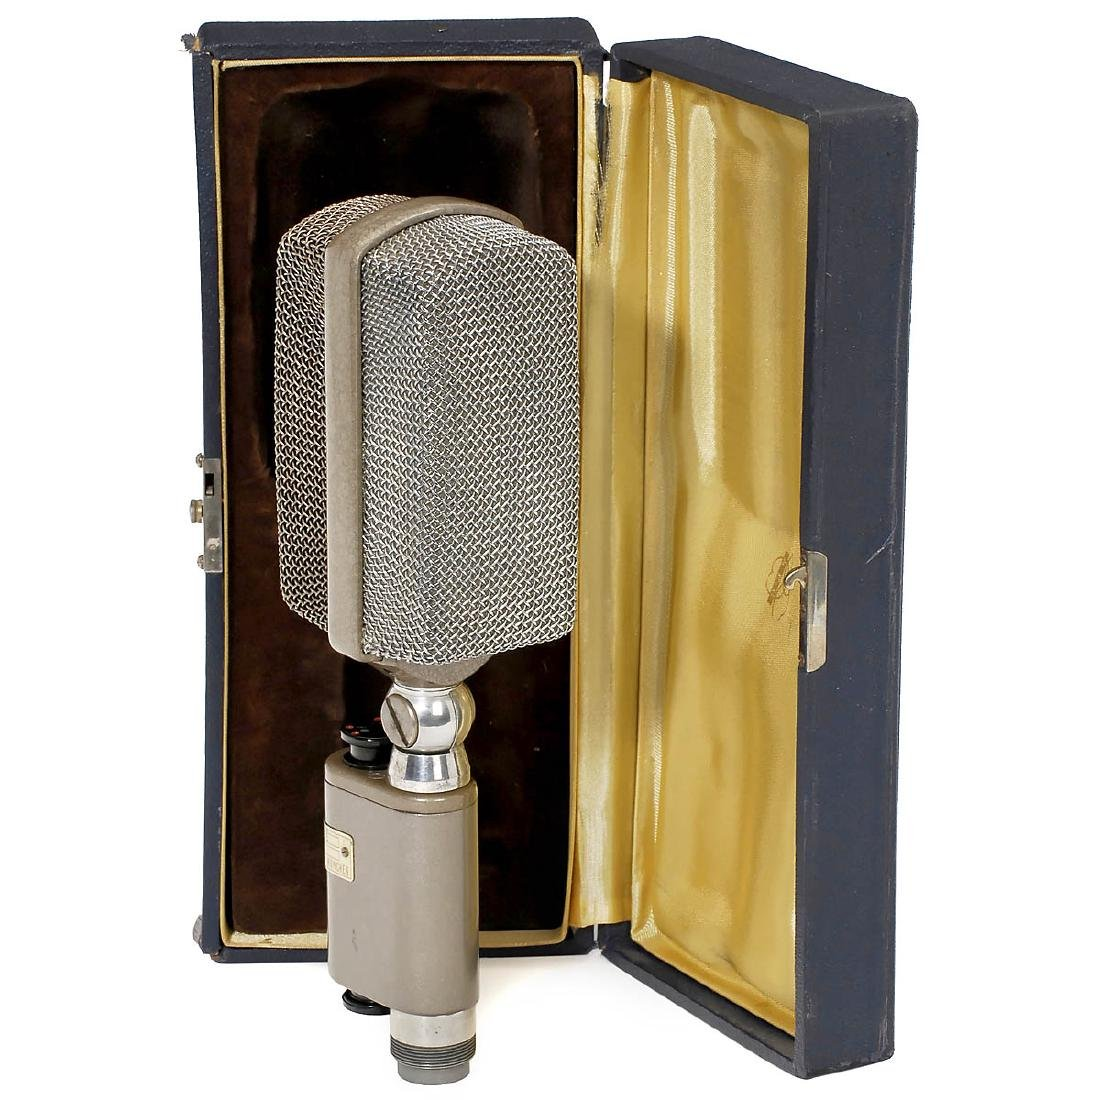 AKG D-30 Dynamic Microphone, c. 1960